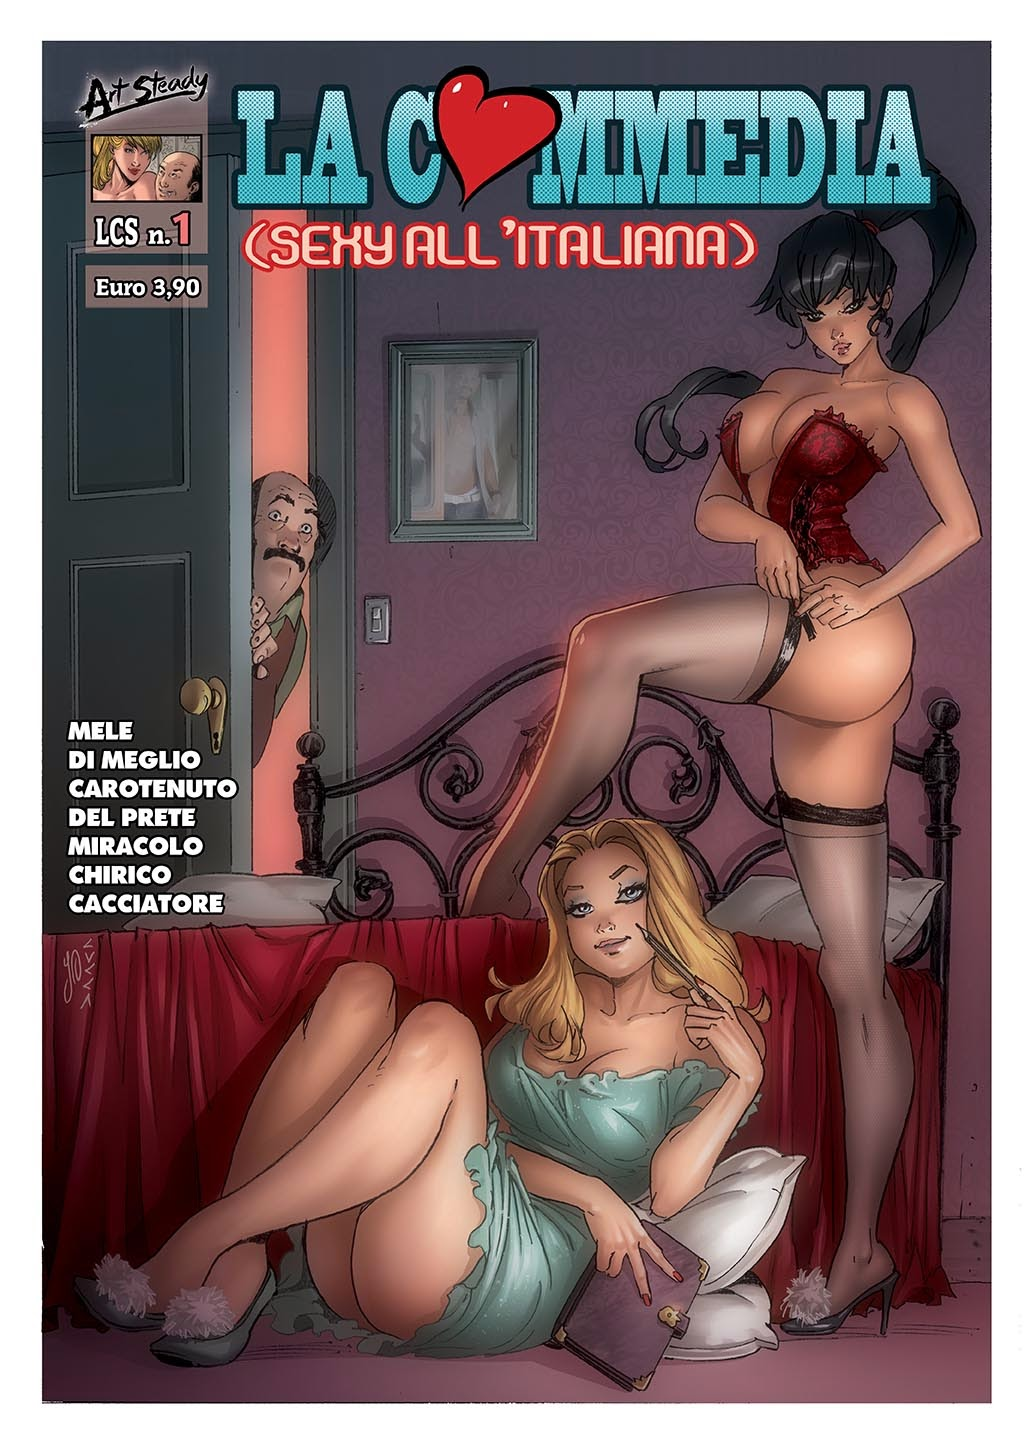 film sex anni 70 massaggiatrice sexi